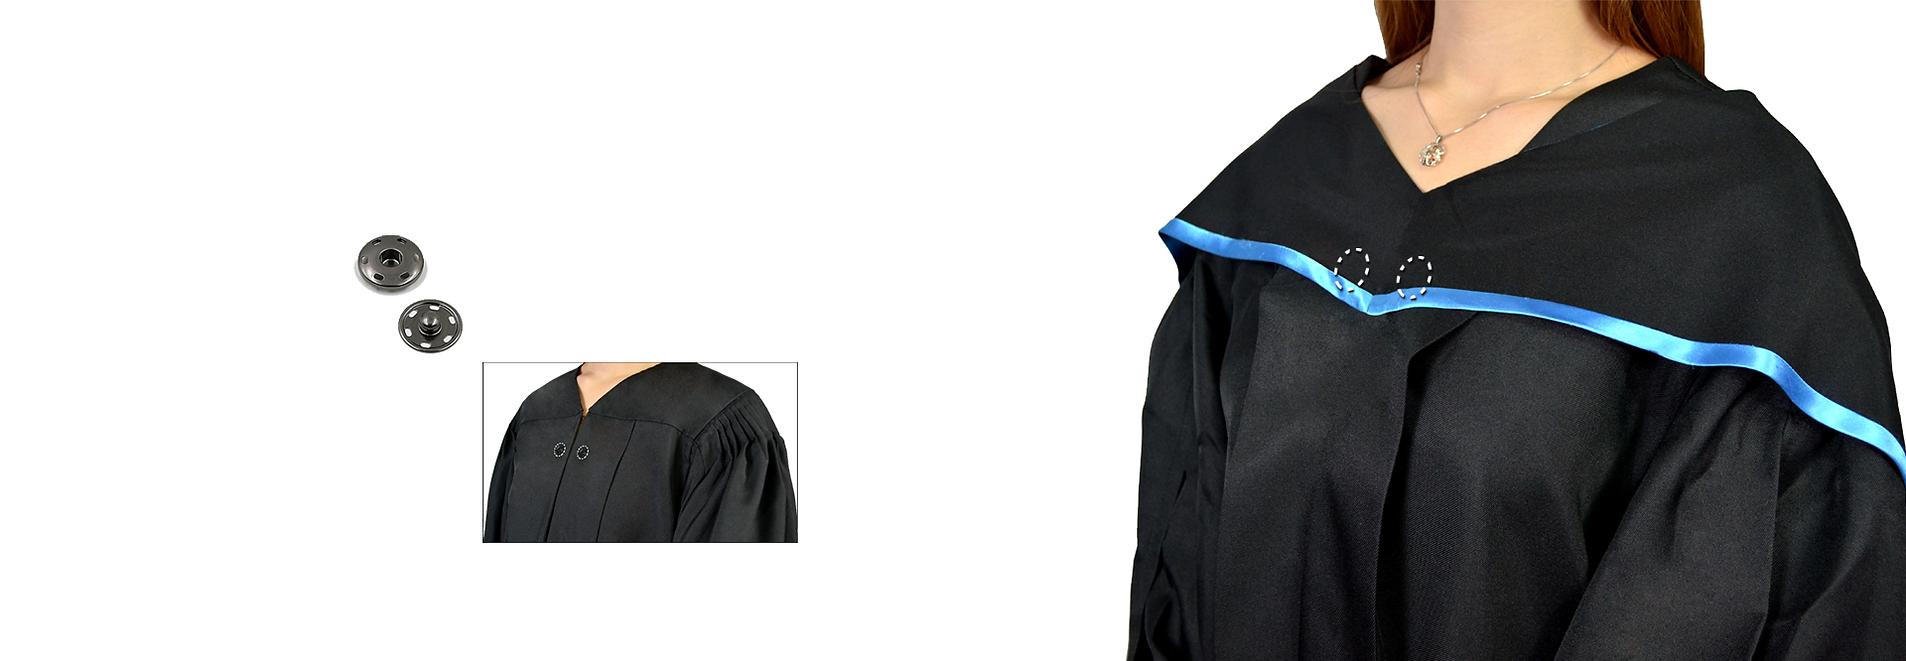 City University of Hong Kong ( CityU ) Graduation Gown | Academic Dress and Academic Regalia | Rent or Buy 租借、購買香港城市大學畢業袍 |  城大畢業袍  | 學士畢業袍、碩士畢業袍、博士畢業袍